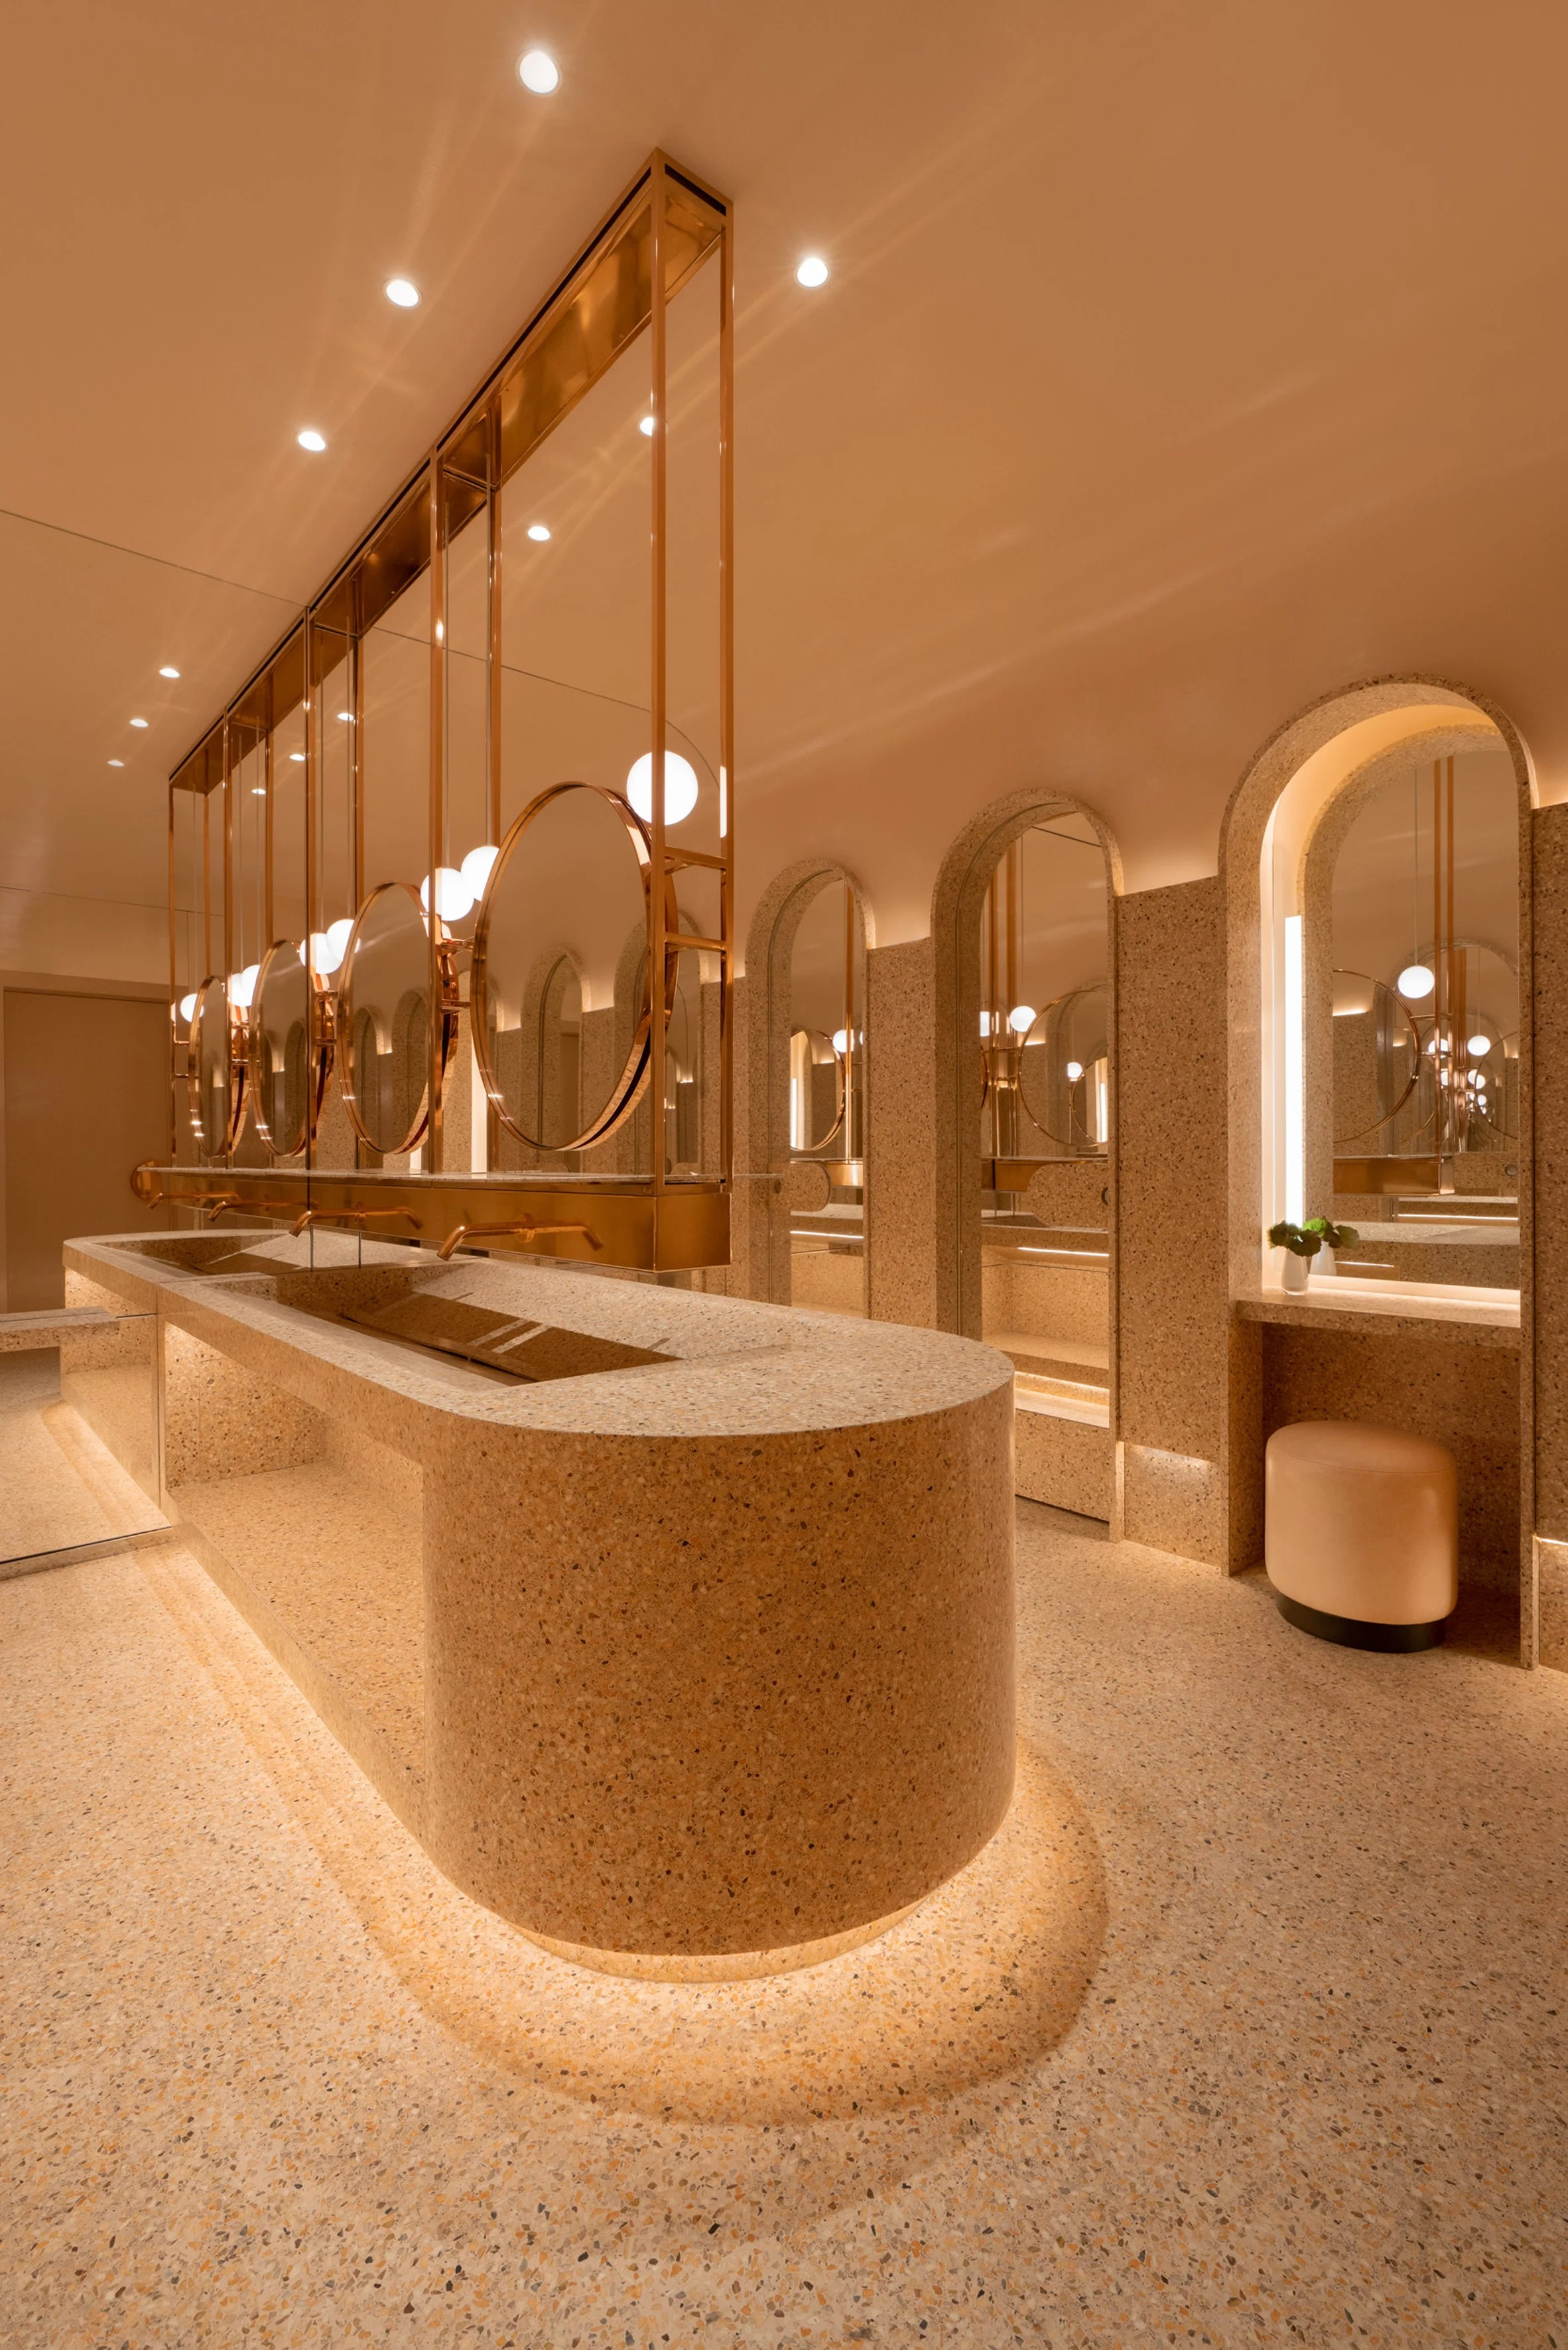 Four Seasons Hotel Montreal by Atelier Zebulon Perron